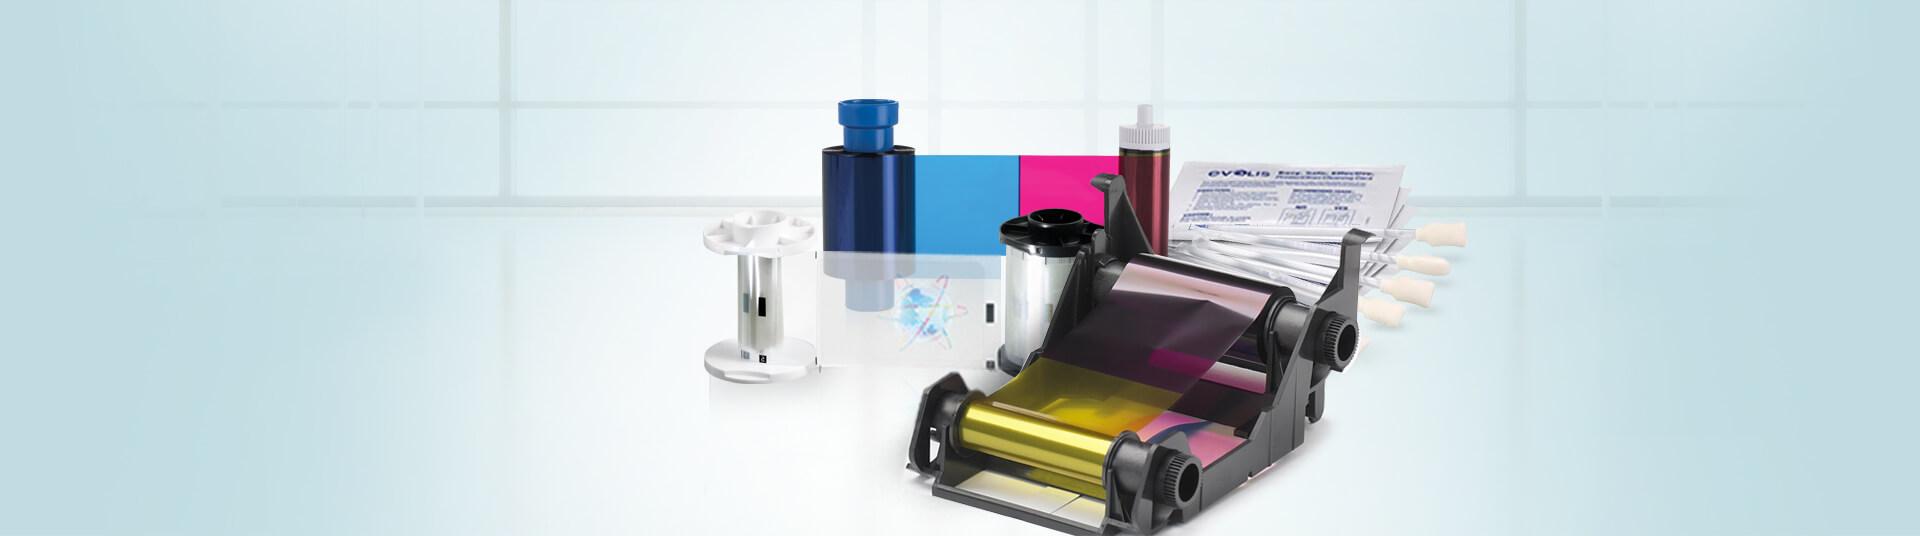 How to Maintain Optimum Printer Performance